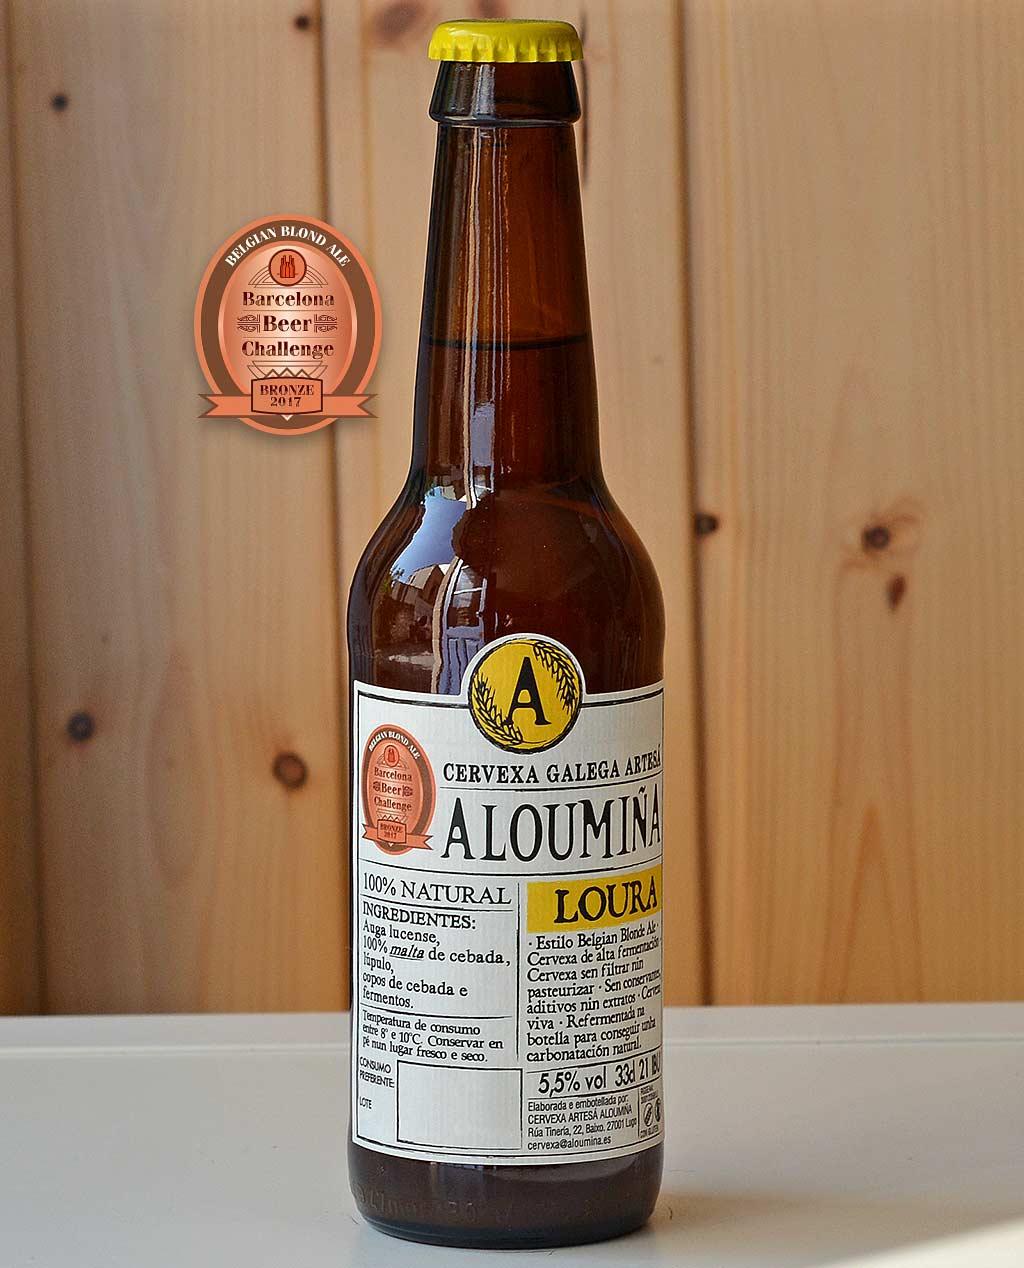 aloumina-cerveza-artesana-craft-beer-lugo-galicia-loura-bbc-barcelonabeerchallenge-belgianblondeale-1024